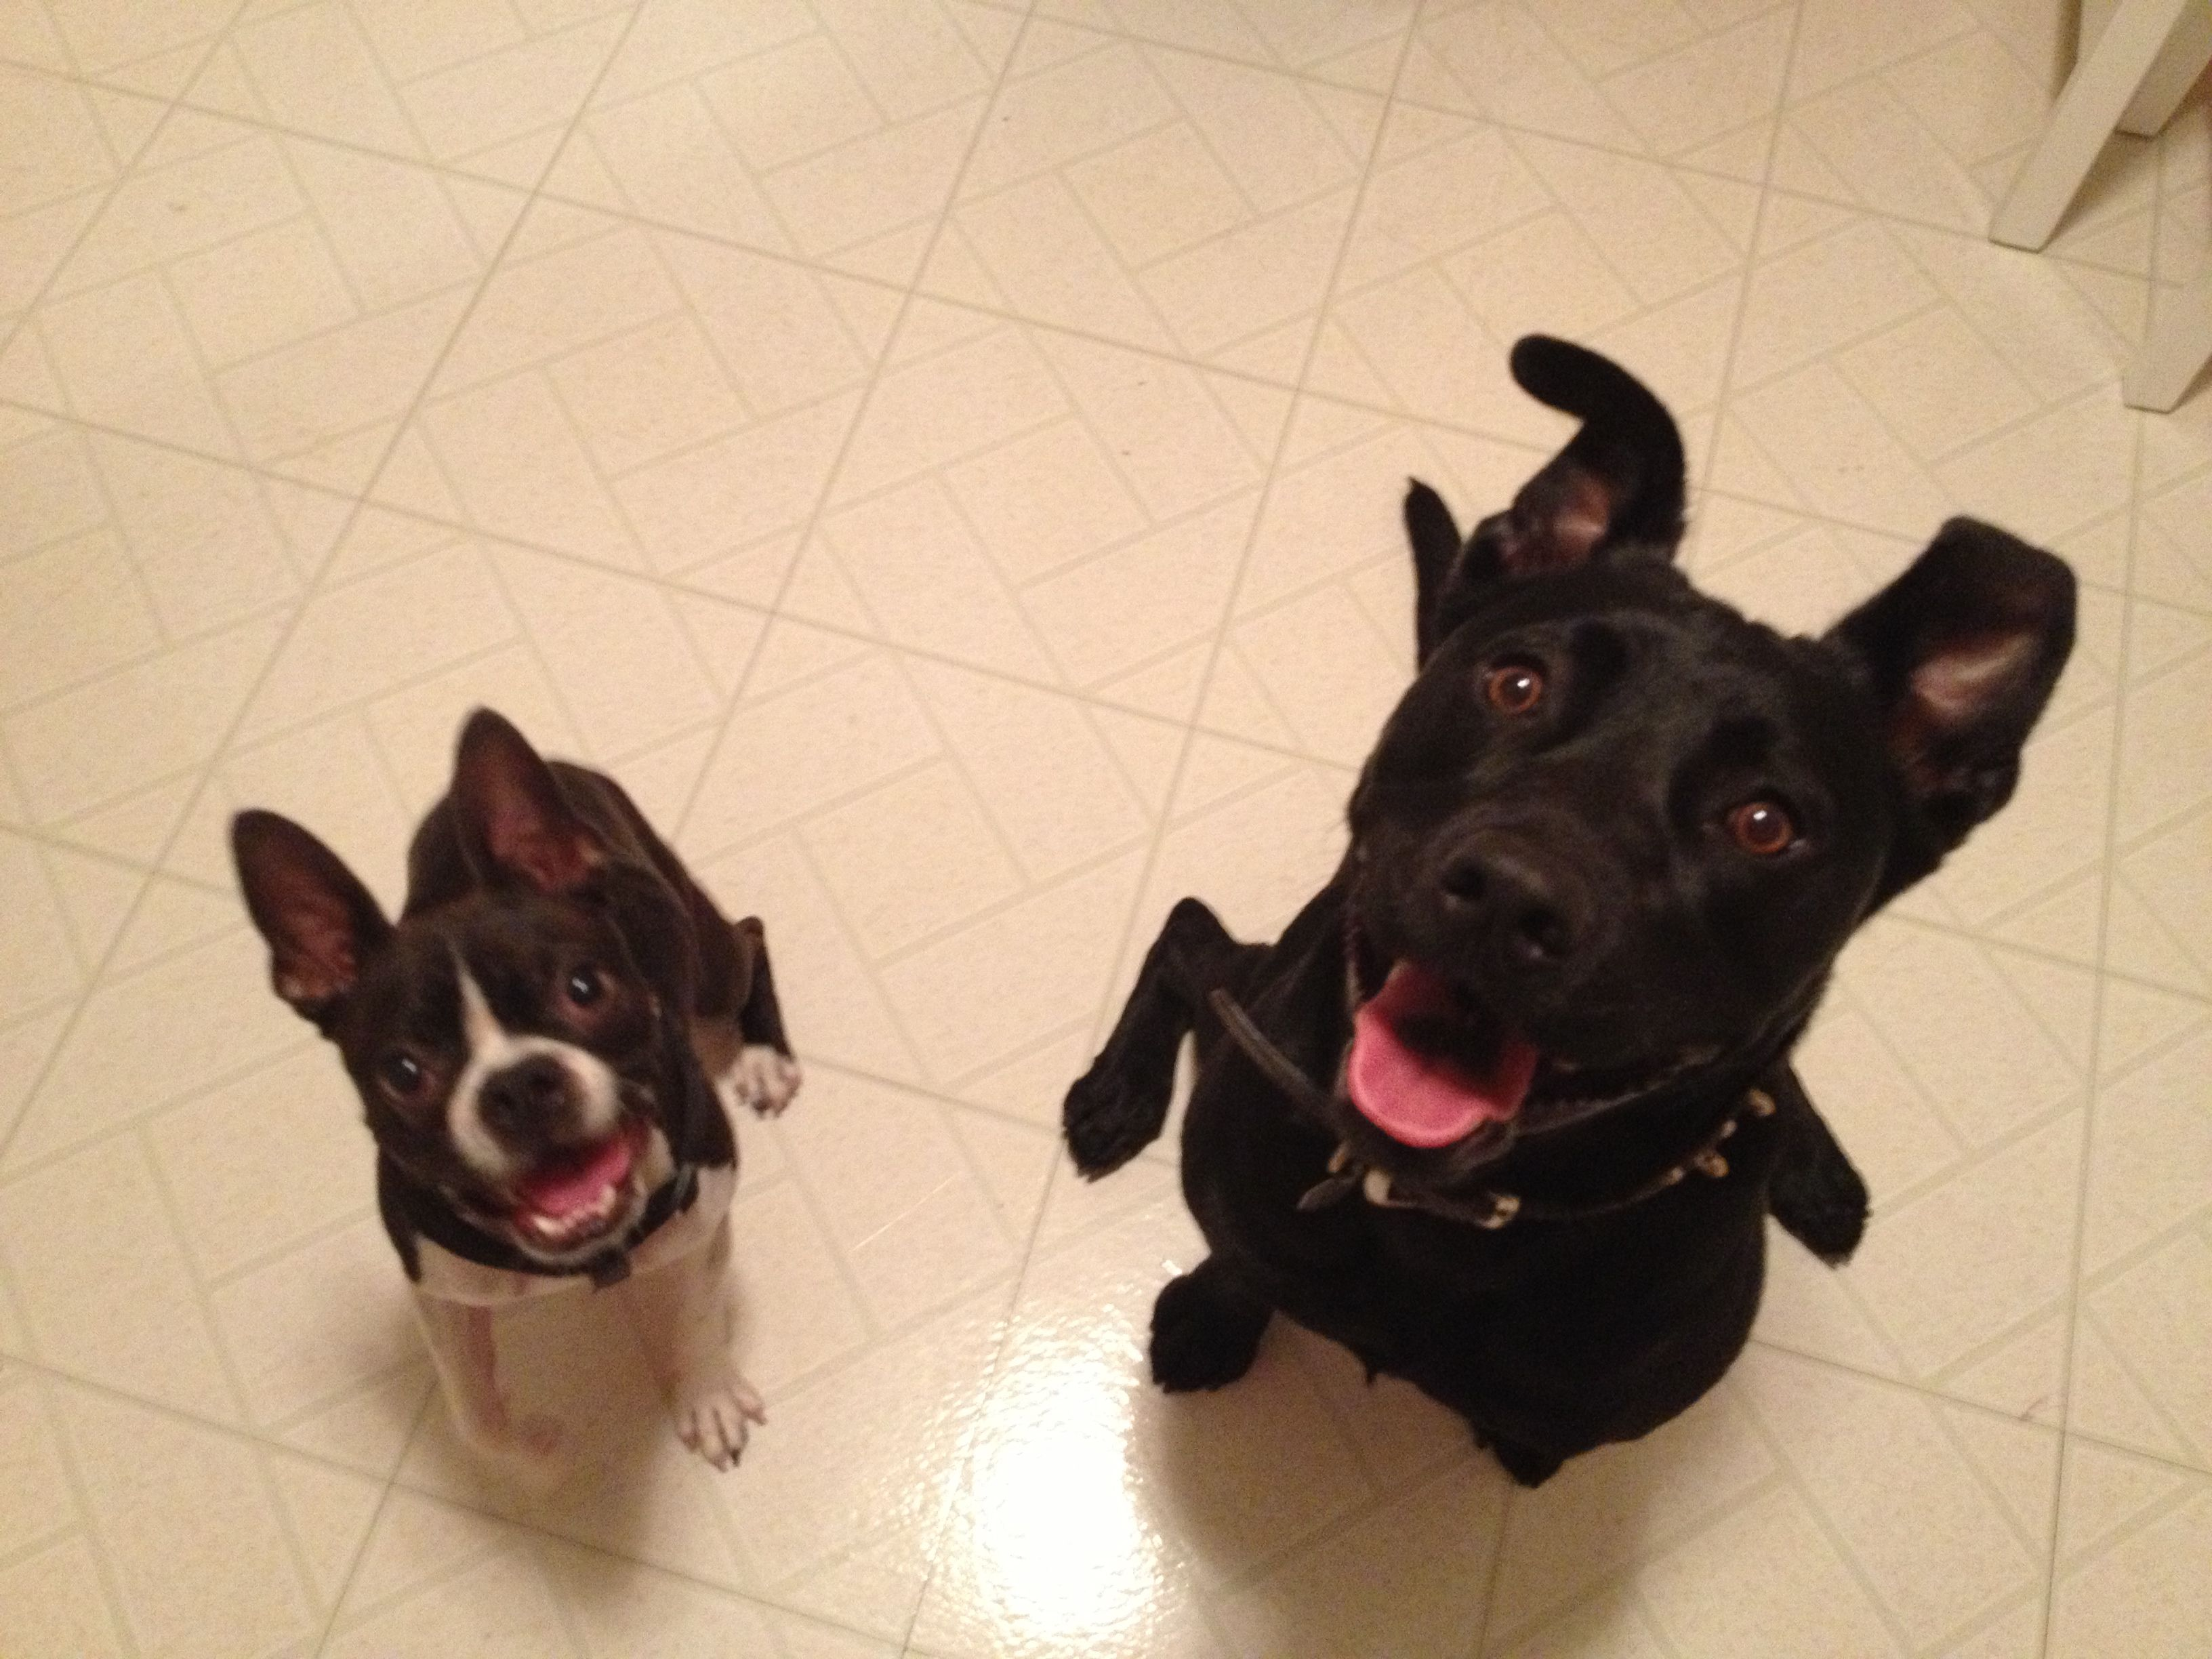 Best Friends Boston Terrier Black Lab Pitbull Animals Puppies Dogs